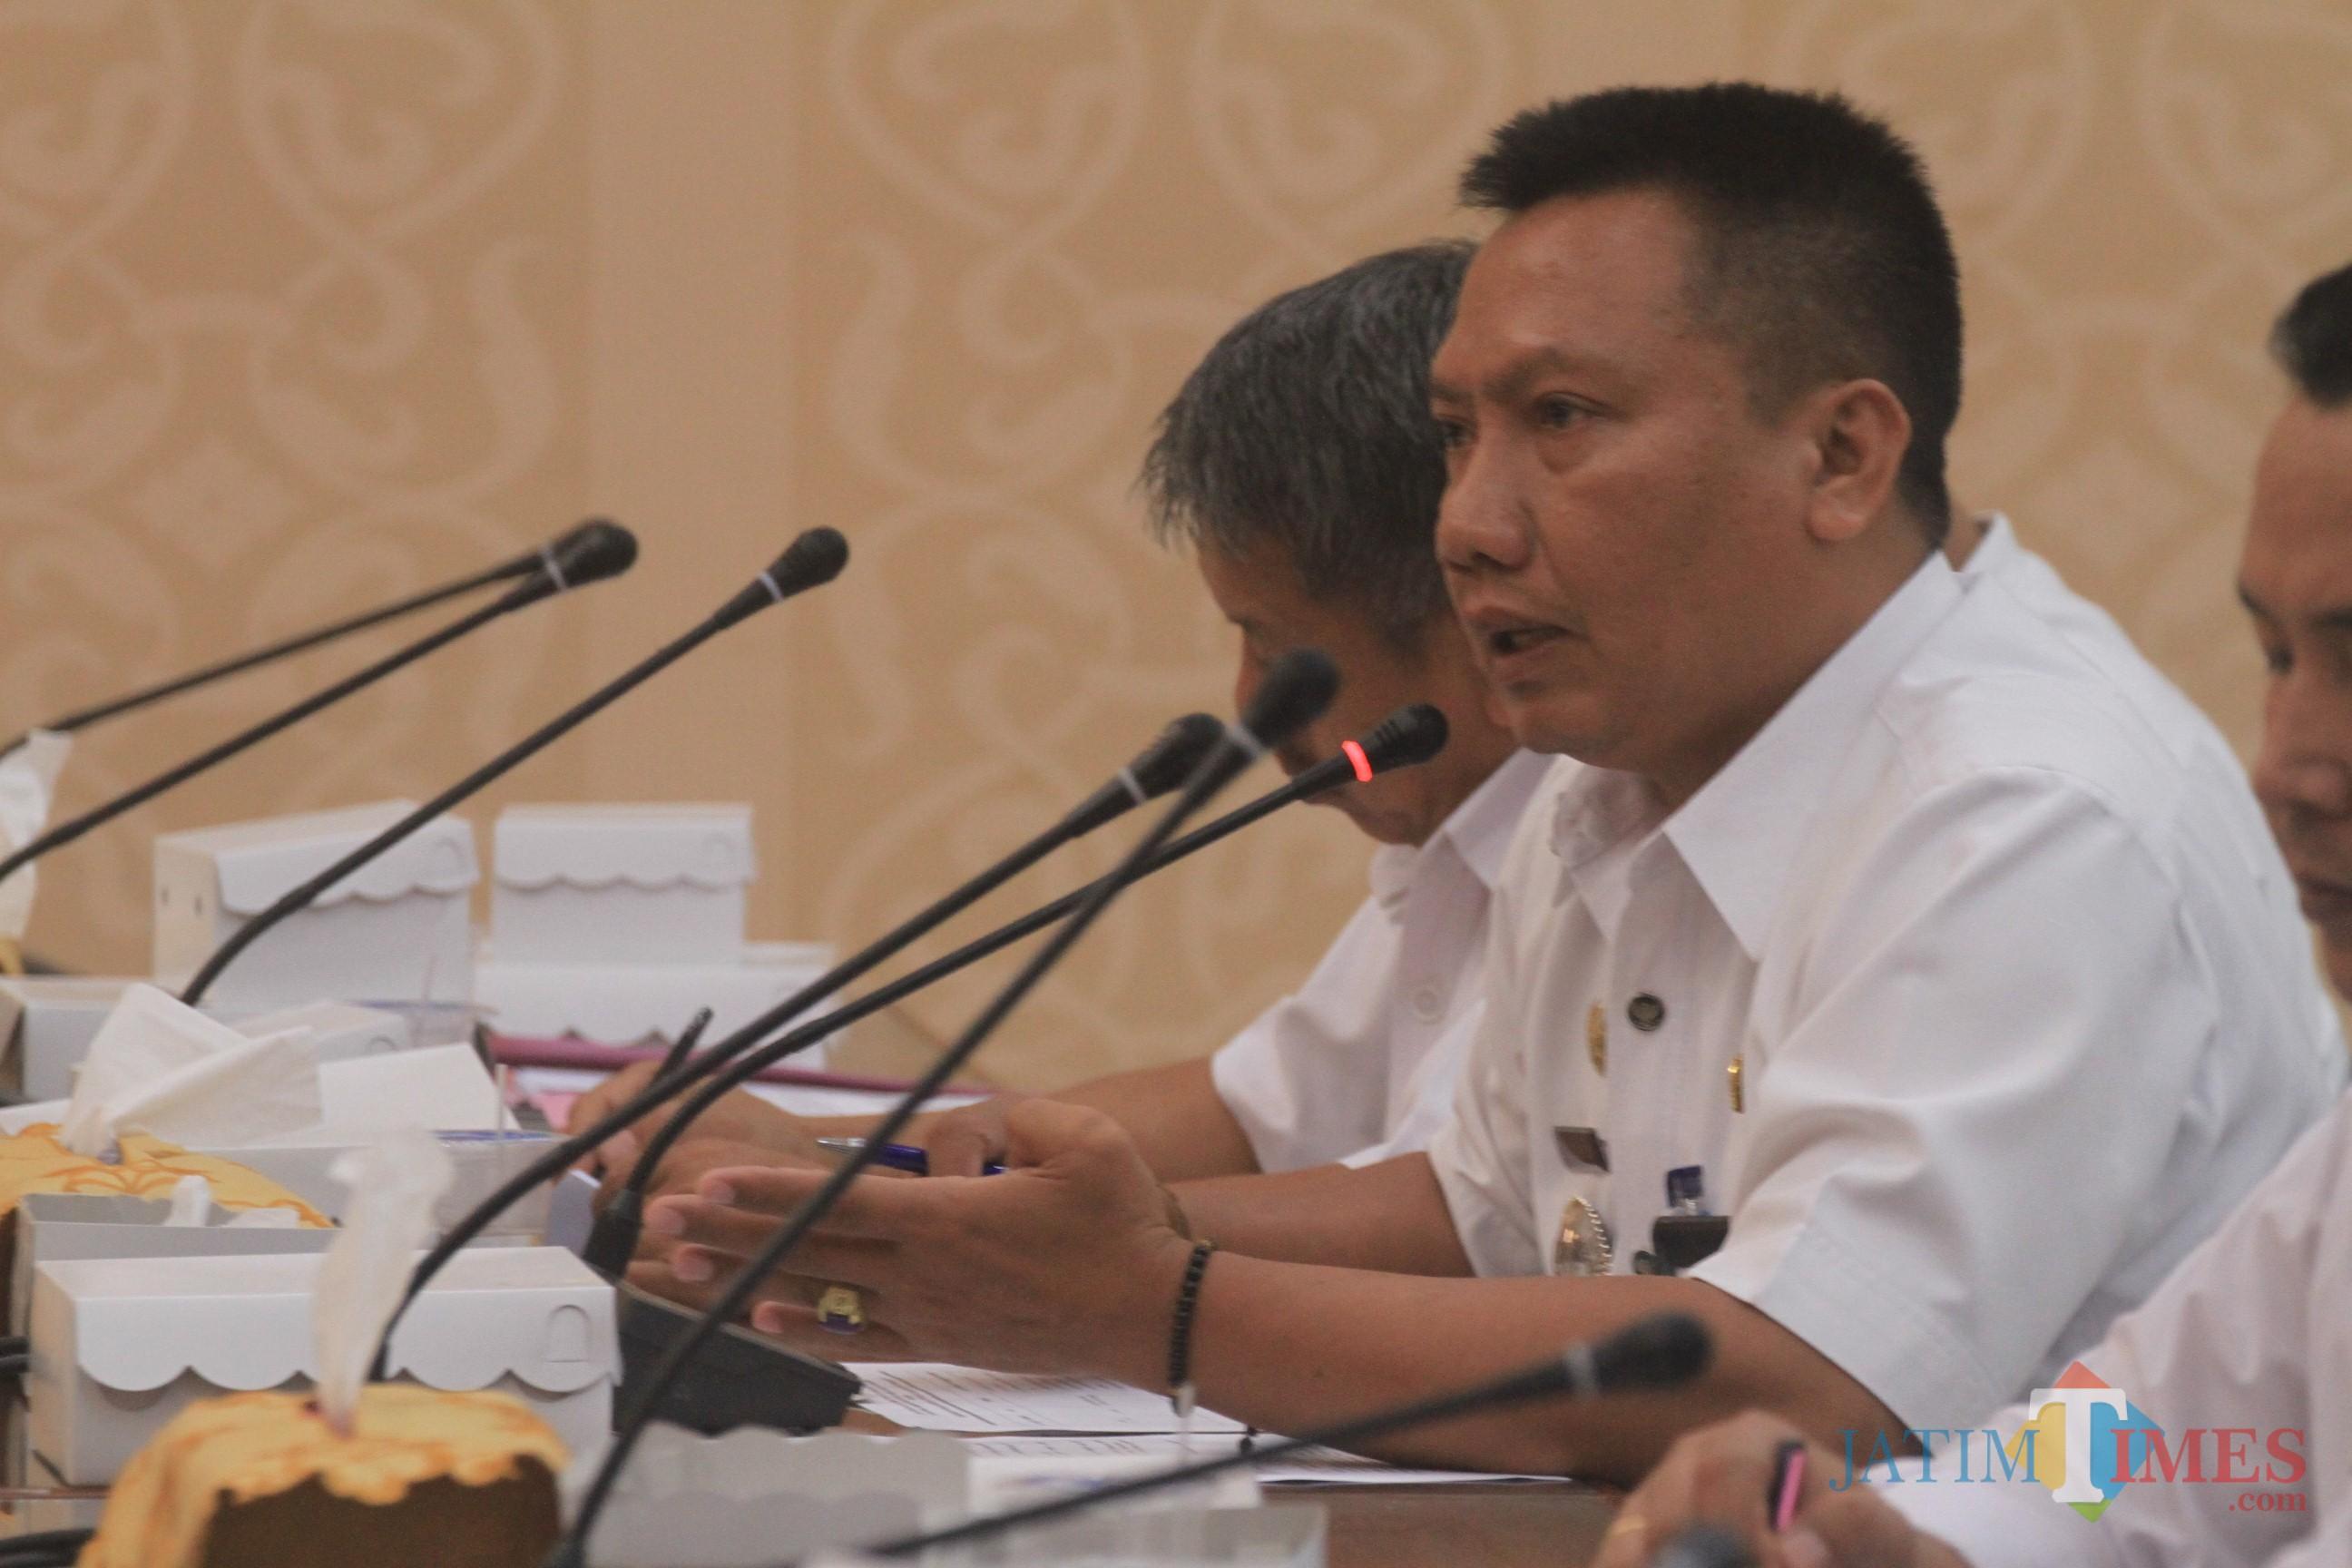 Camat Kedopok Imam Cahyadi saat menenyakan juklak dan juknis dana kelurahan pada rakor dengan komisi 1 (Agus Salam/Jatim TIMES)